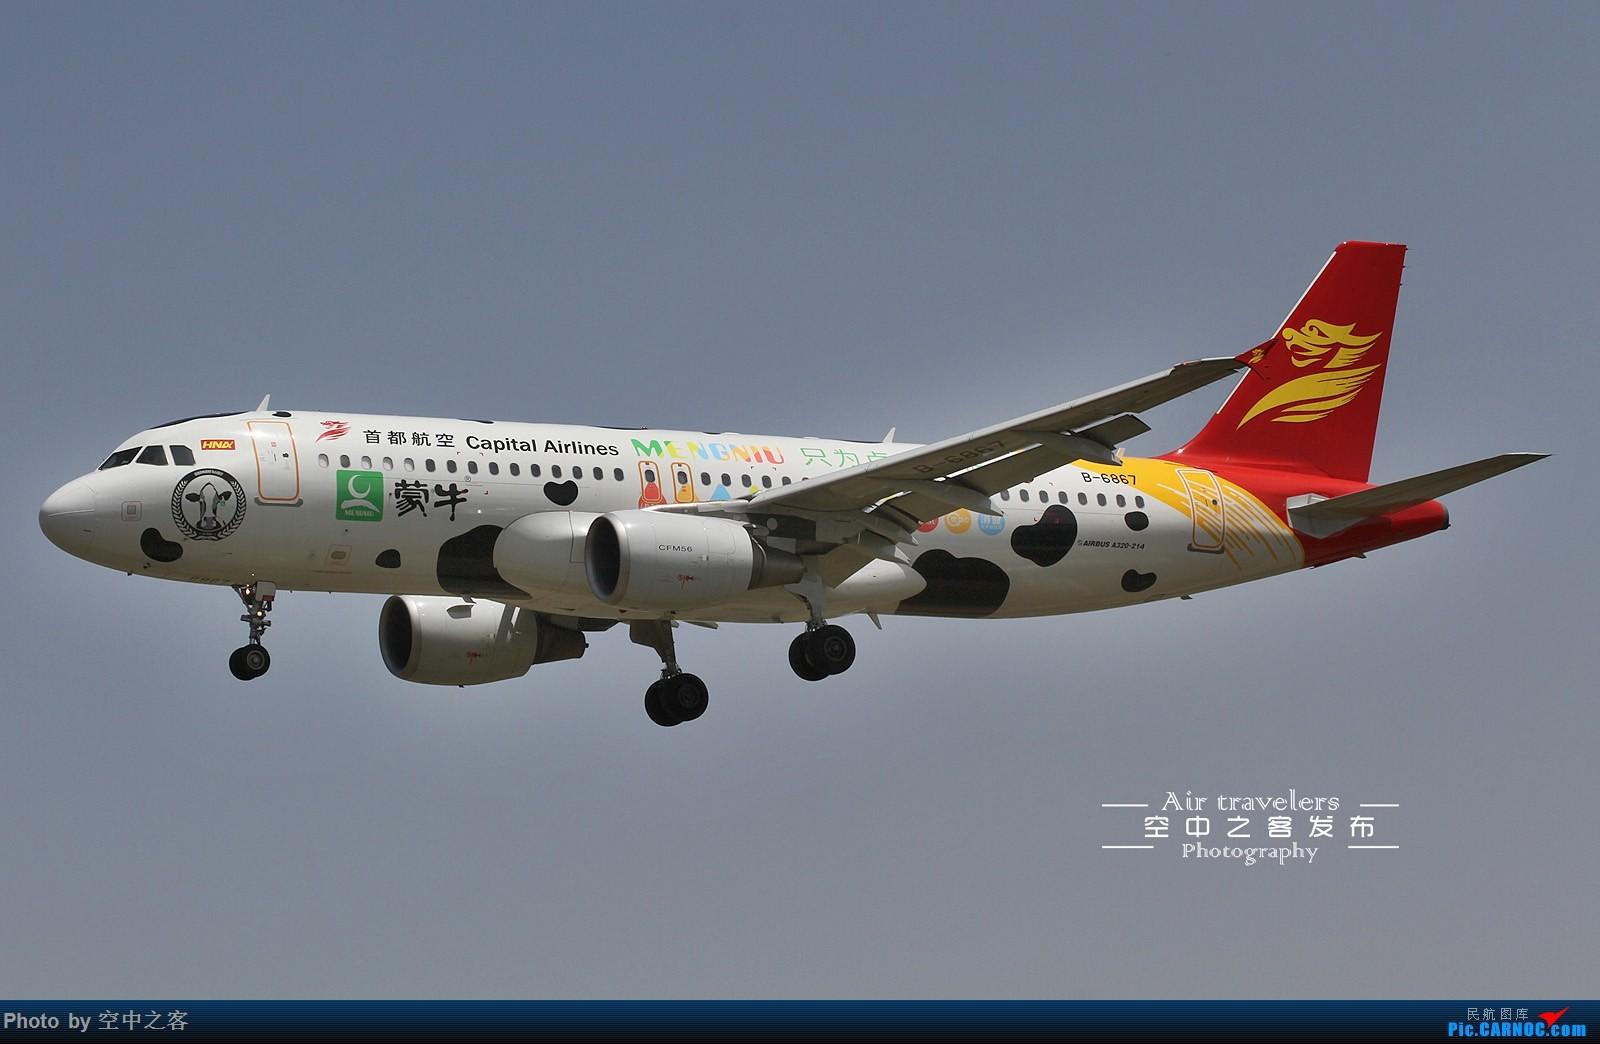 Re:[原创]][合肥飞友会·霸都打机队]空中之客发布 大佬们都不来的新机场 龙江321 海航 首航广告机来袭 AIRBUS A320-200 B-6867 合肥新桥国际机场